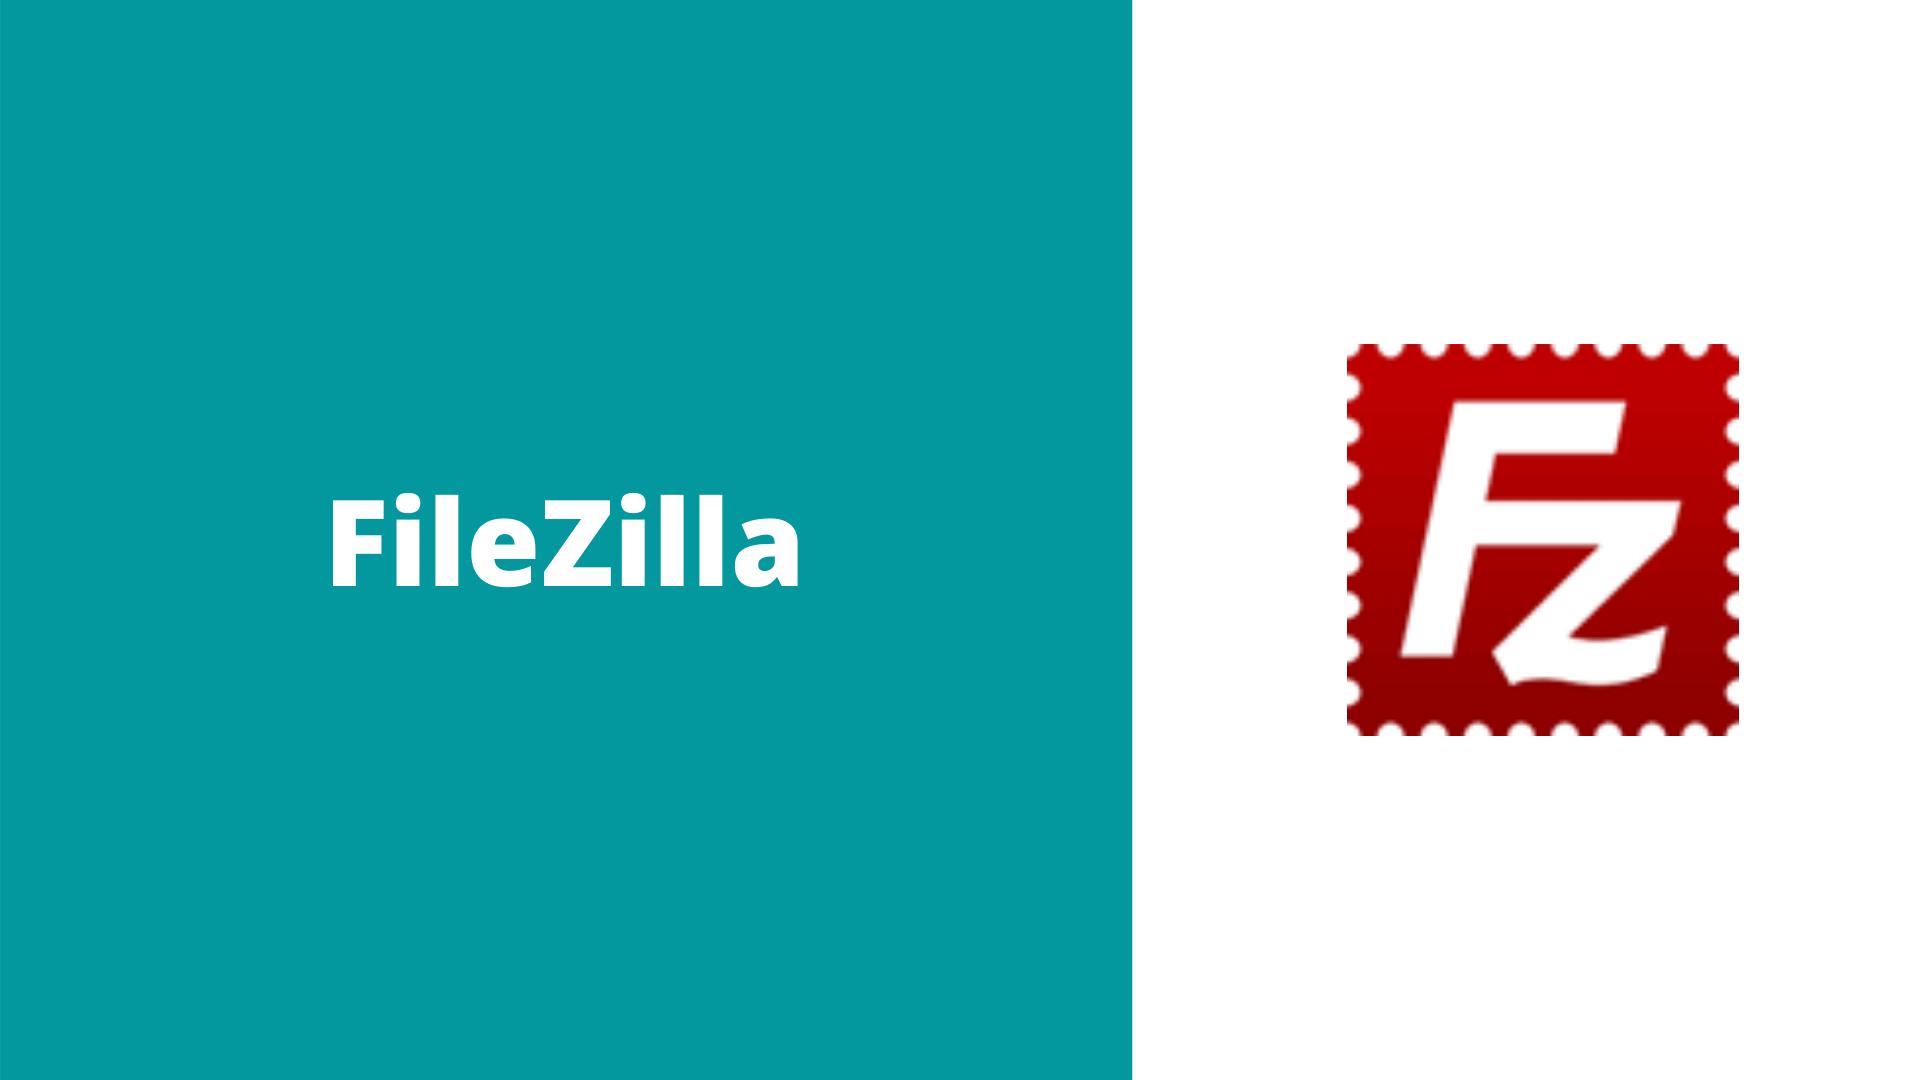 FileZilla-min.png